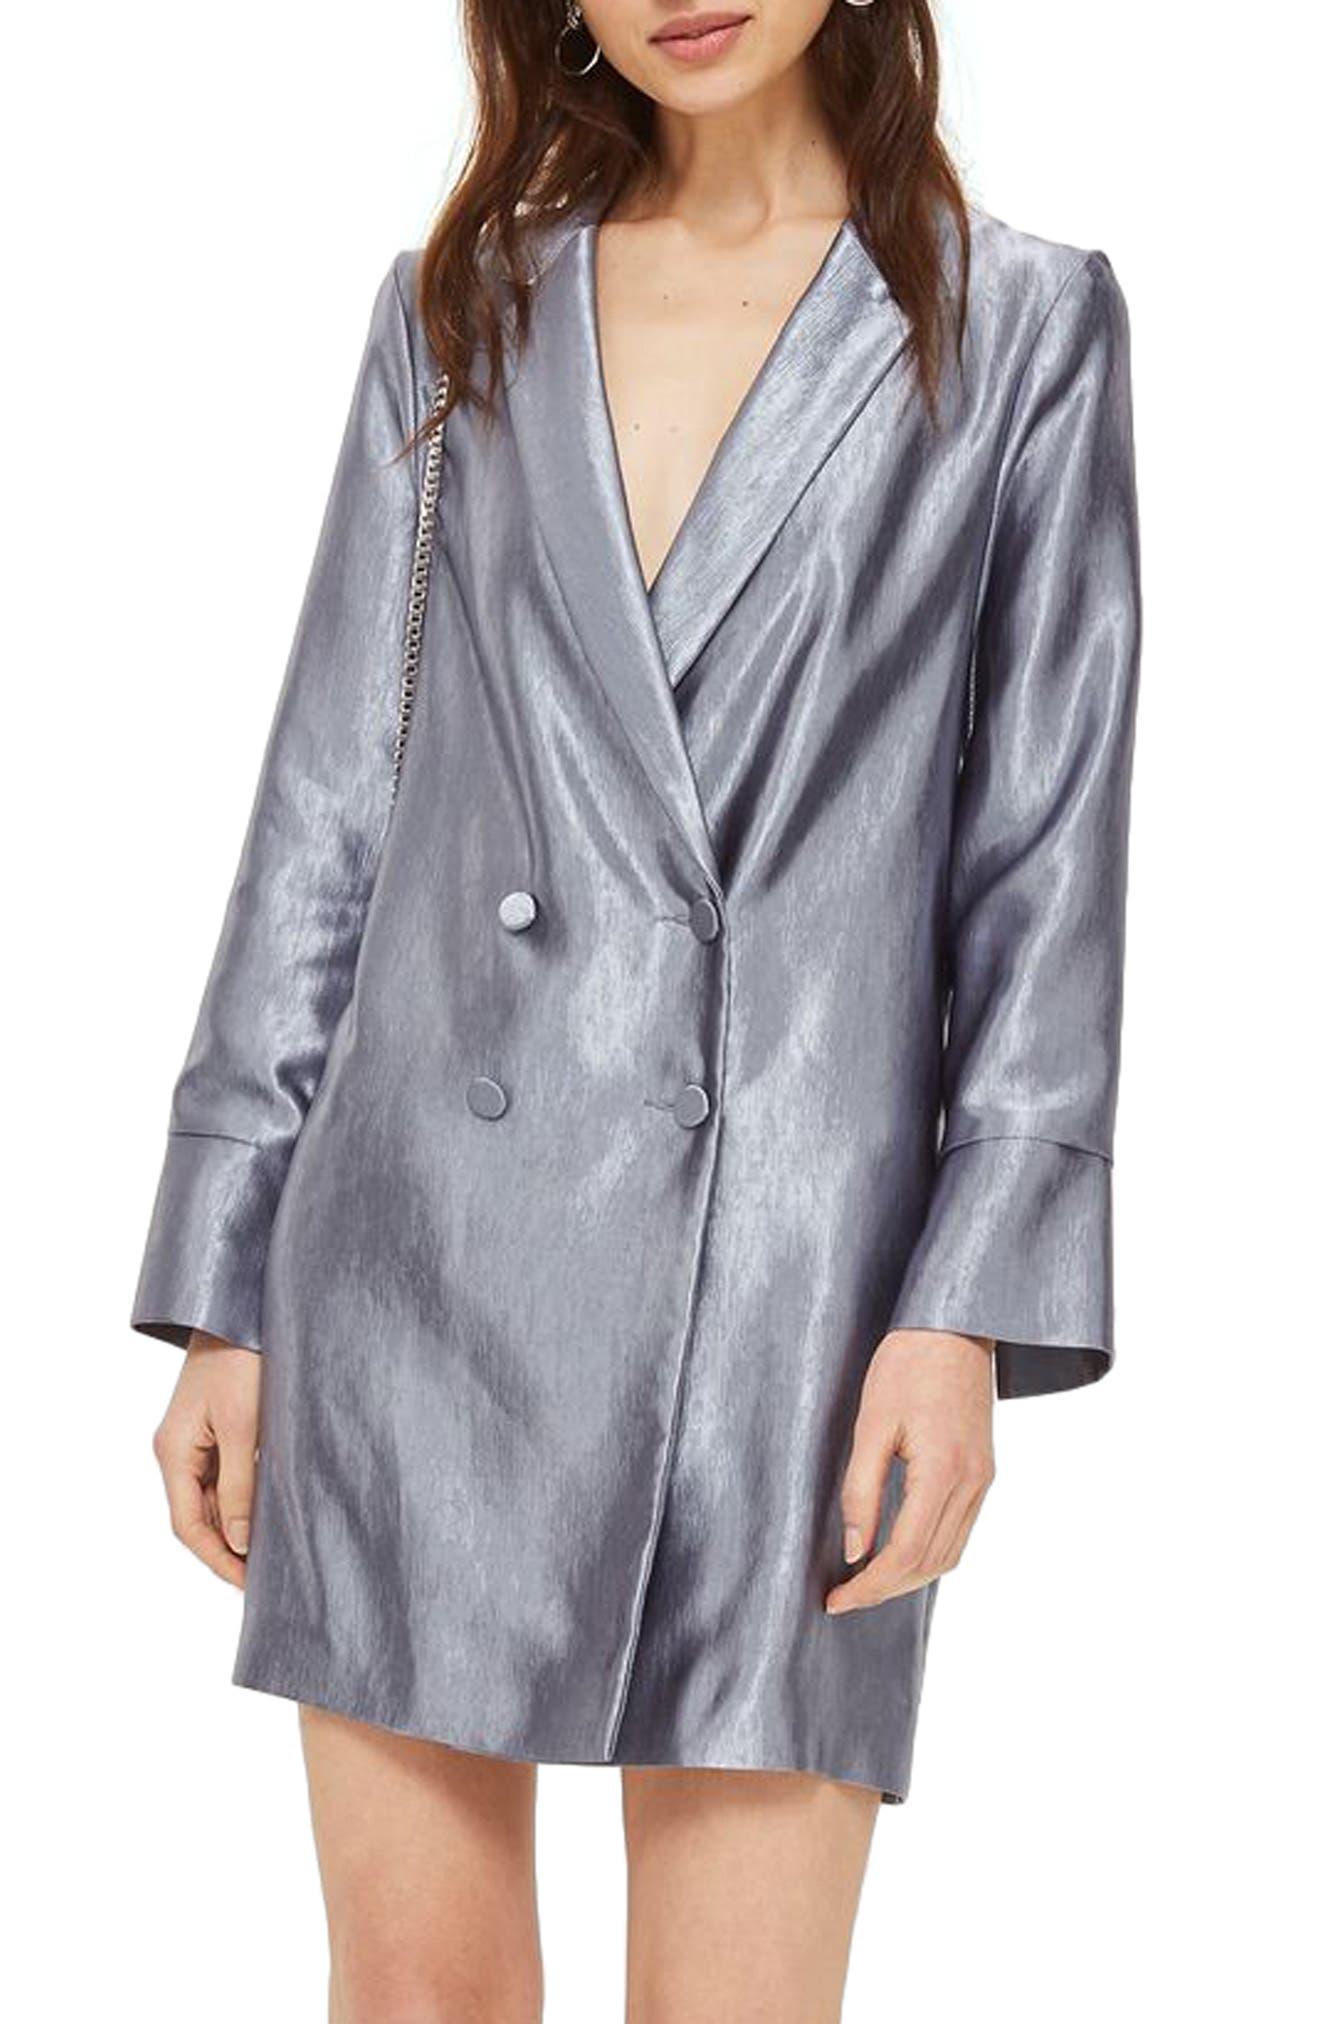 Topshop Crinkled Metallic Satin Blazer Dress